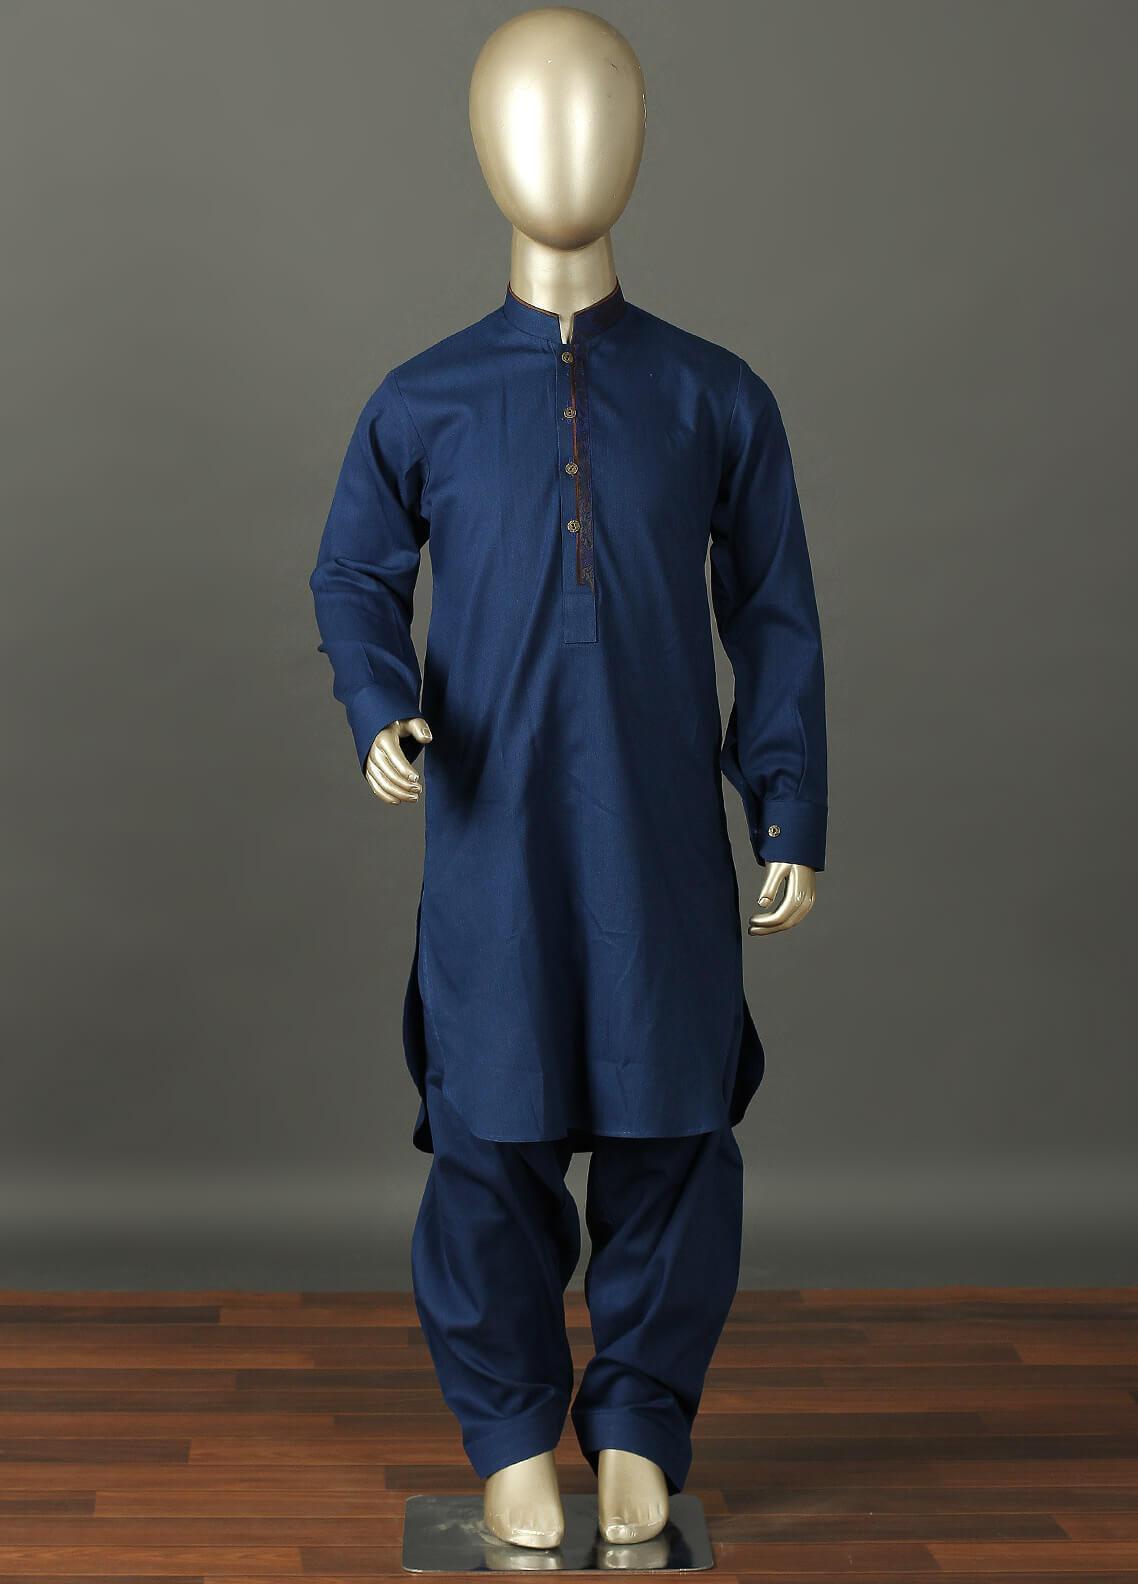 Aizaz Zafar Cotton Formal Kameez Shalwar for Boys -  229 Blue